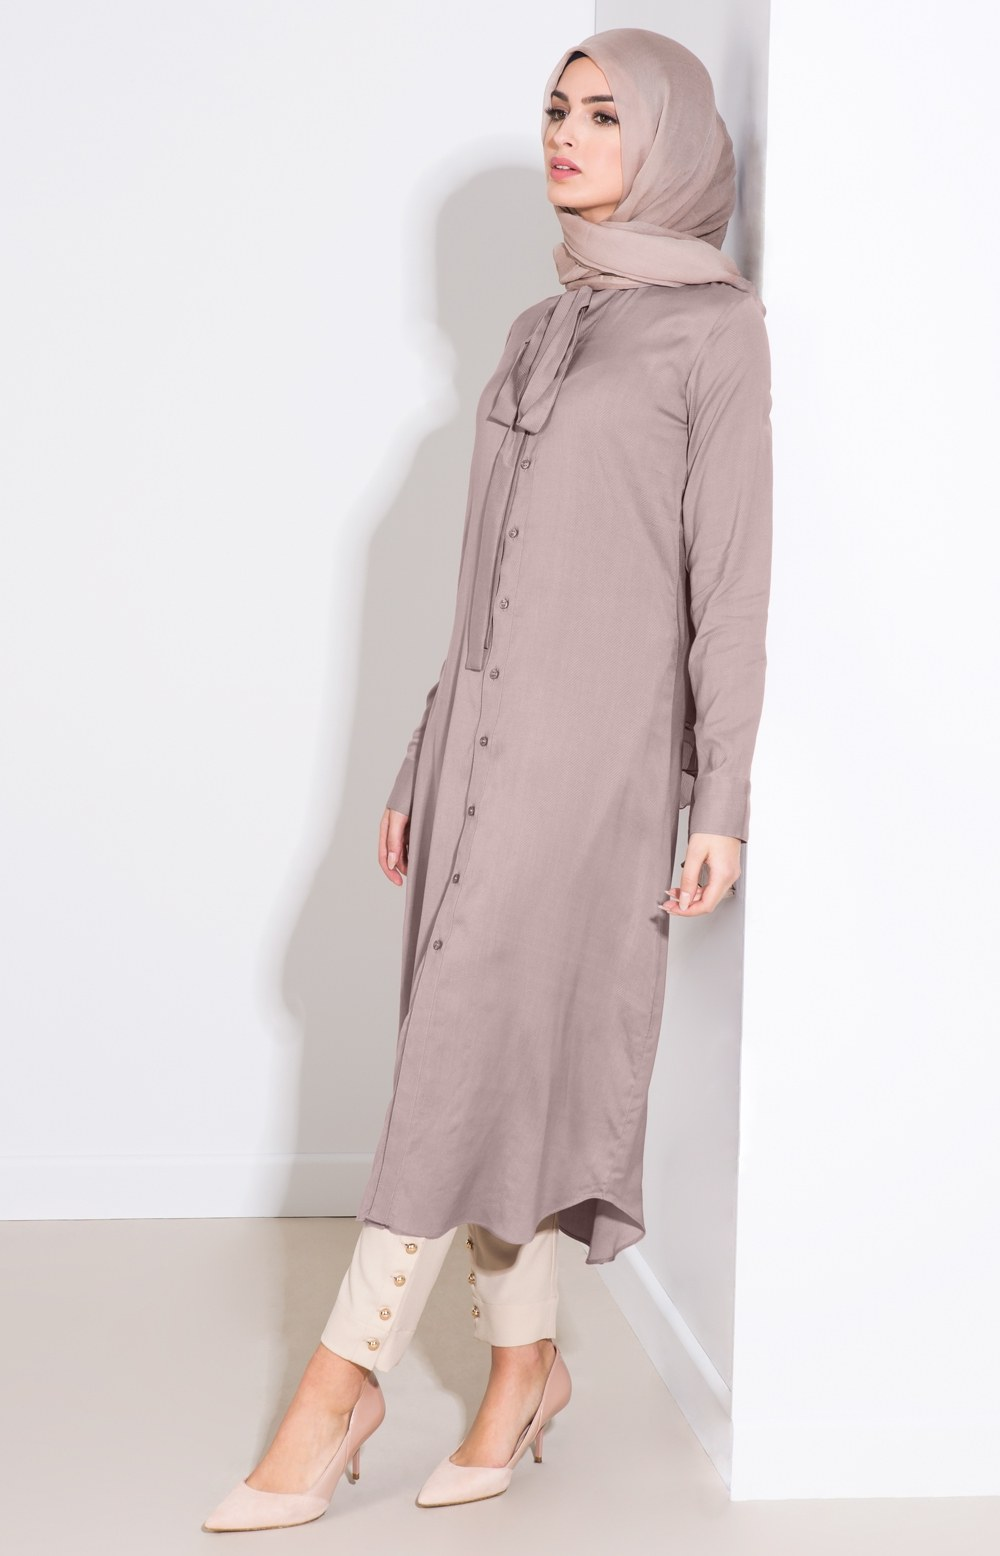 Bentuk Model Baju Lebaran Muslim Terbaru Kvdd 25 Trend Model Baju Muslim Lebaran 2018 Simple & Modis